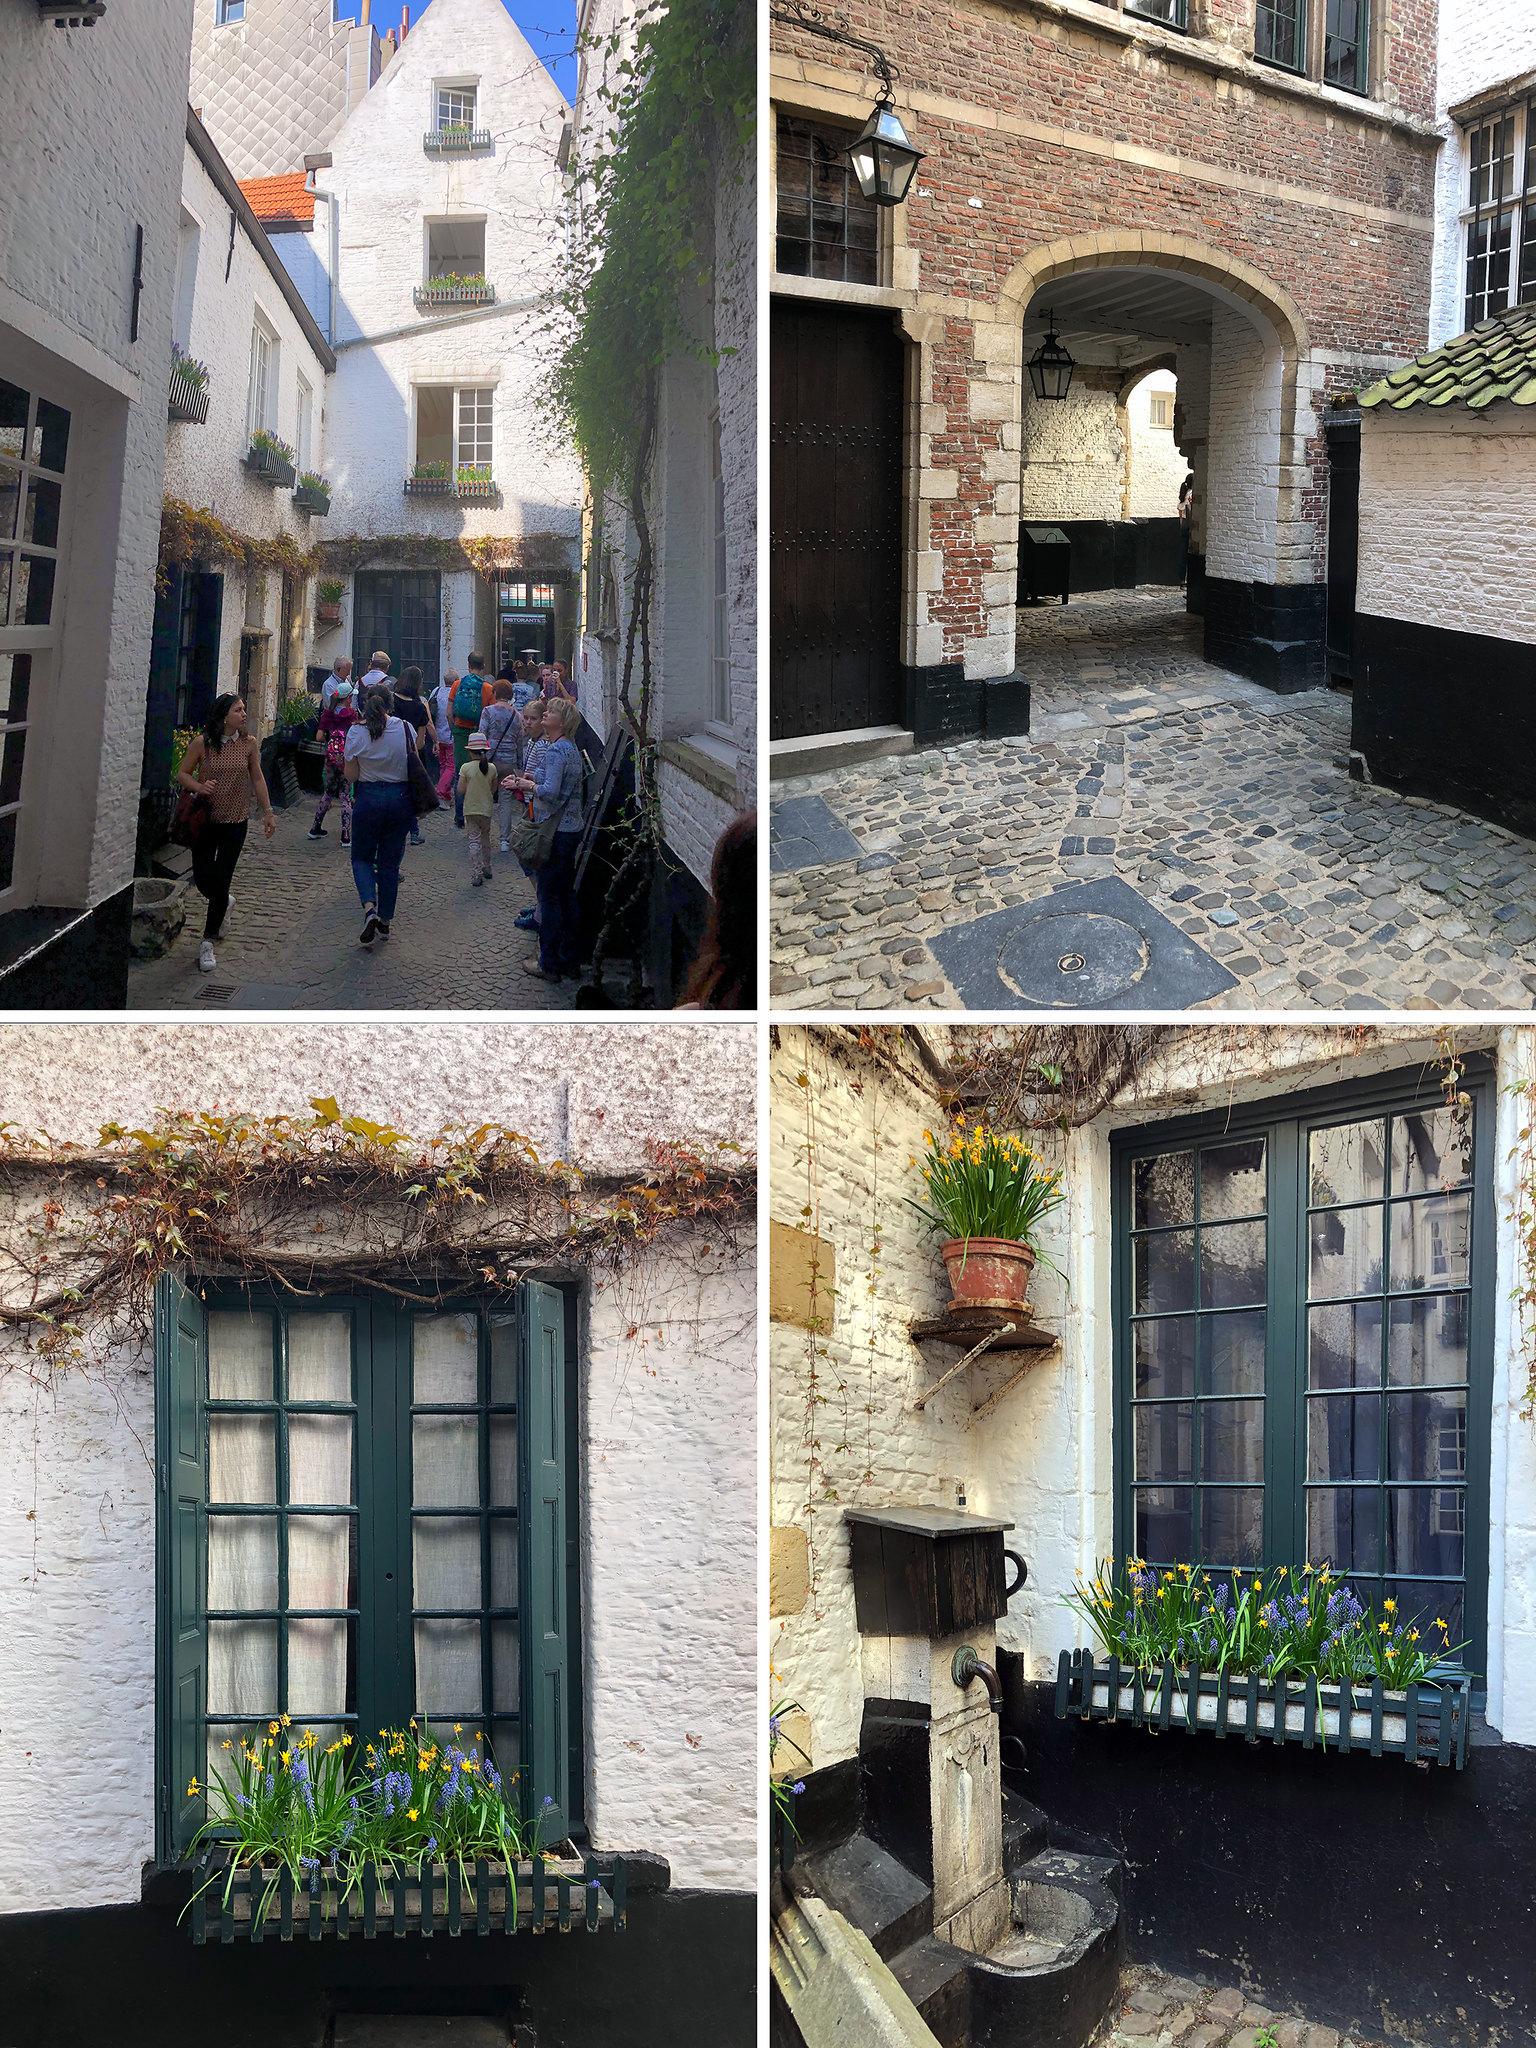 Visitar Amberes en un día, Antwerp in a day, Bélgica, Belgium amberes en un día - 48260797071 9699562c18 k - Amberes en un día